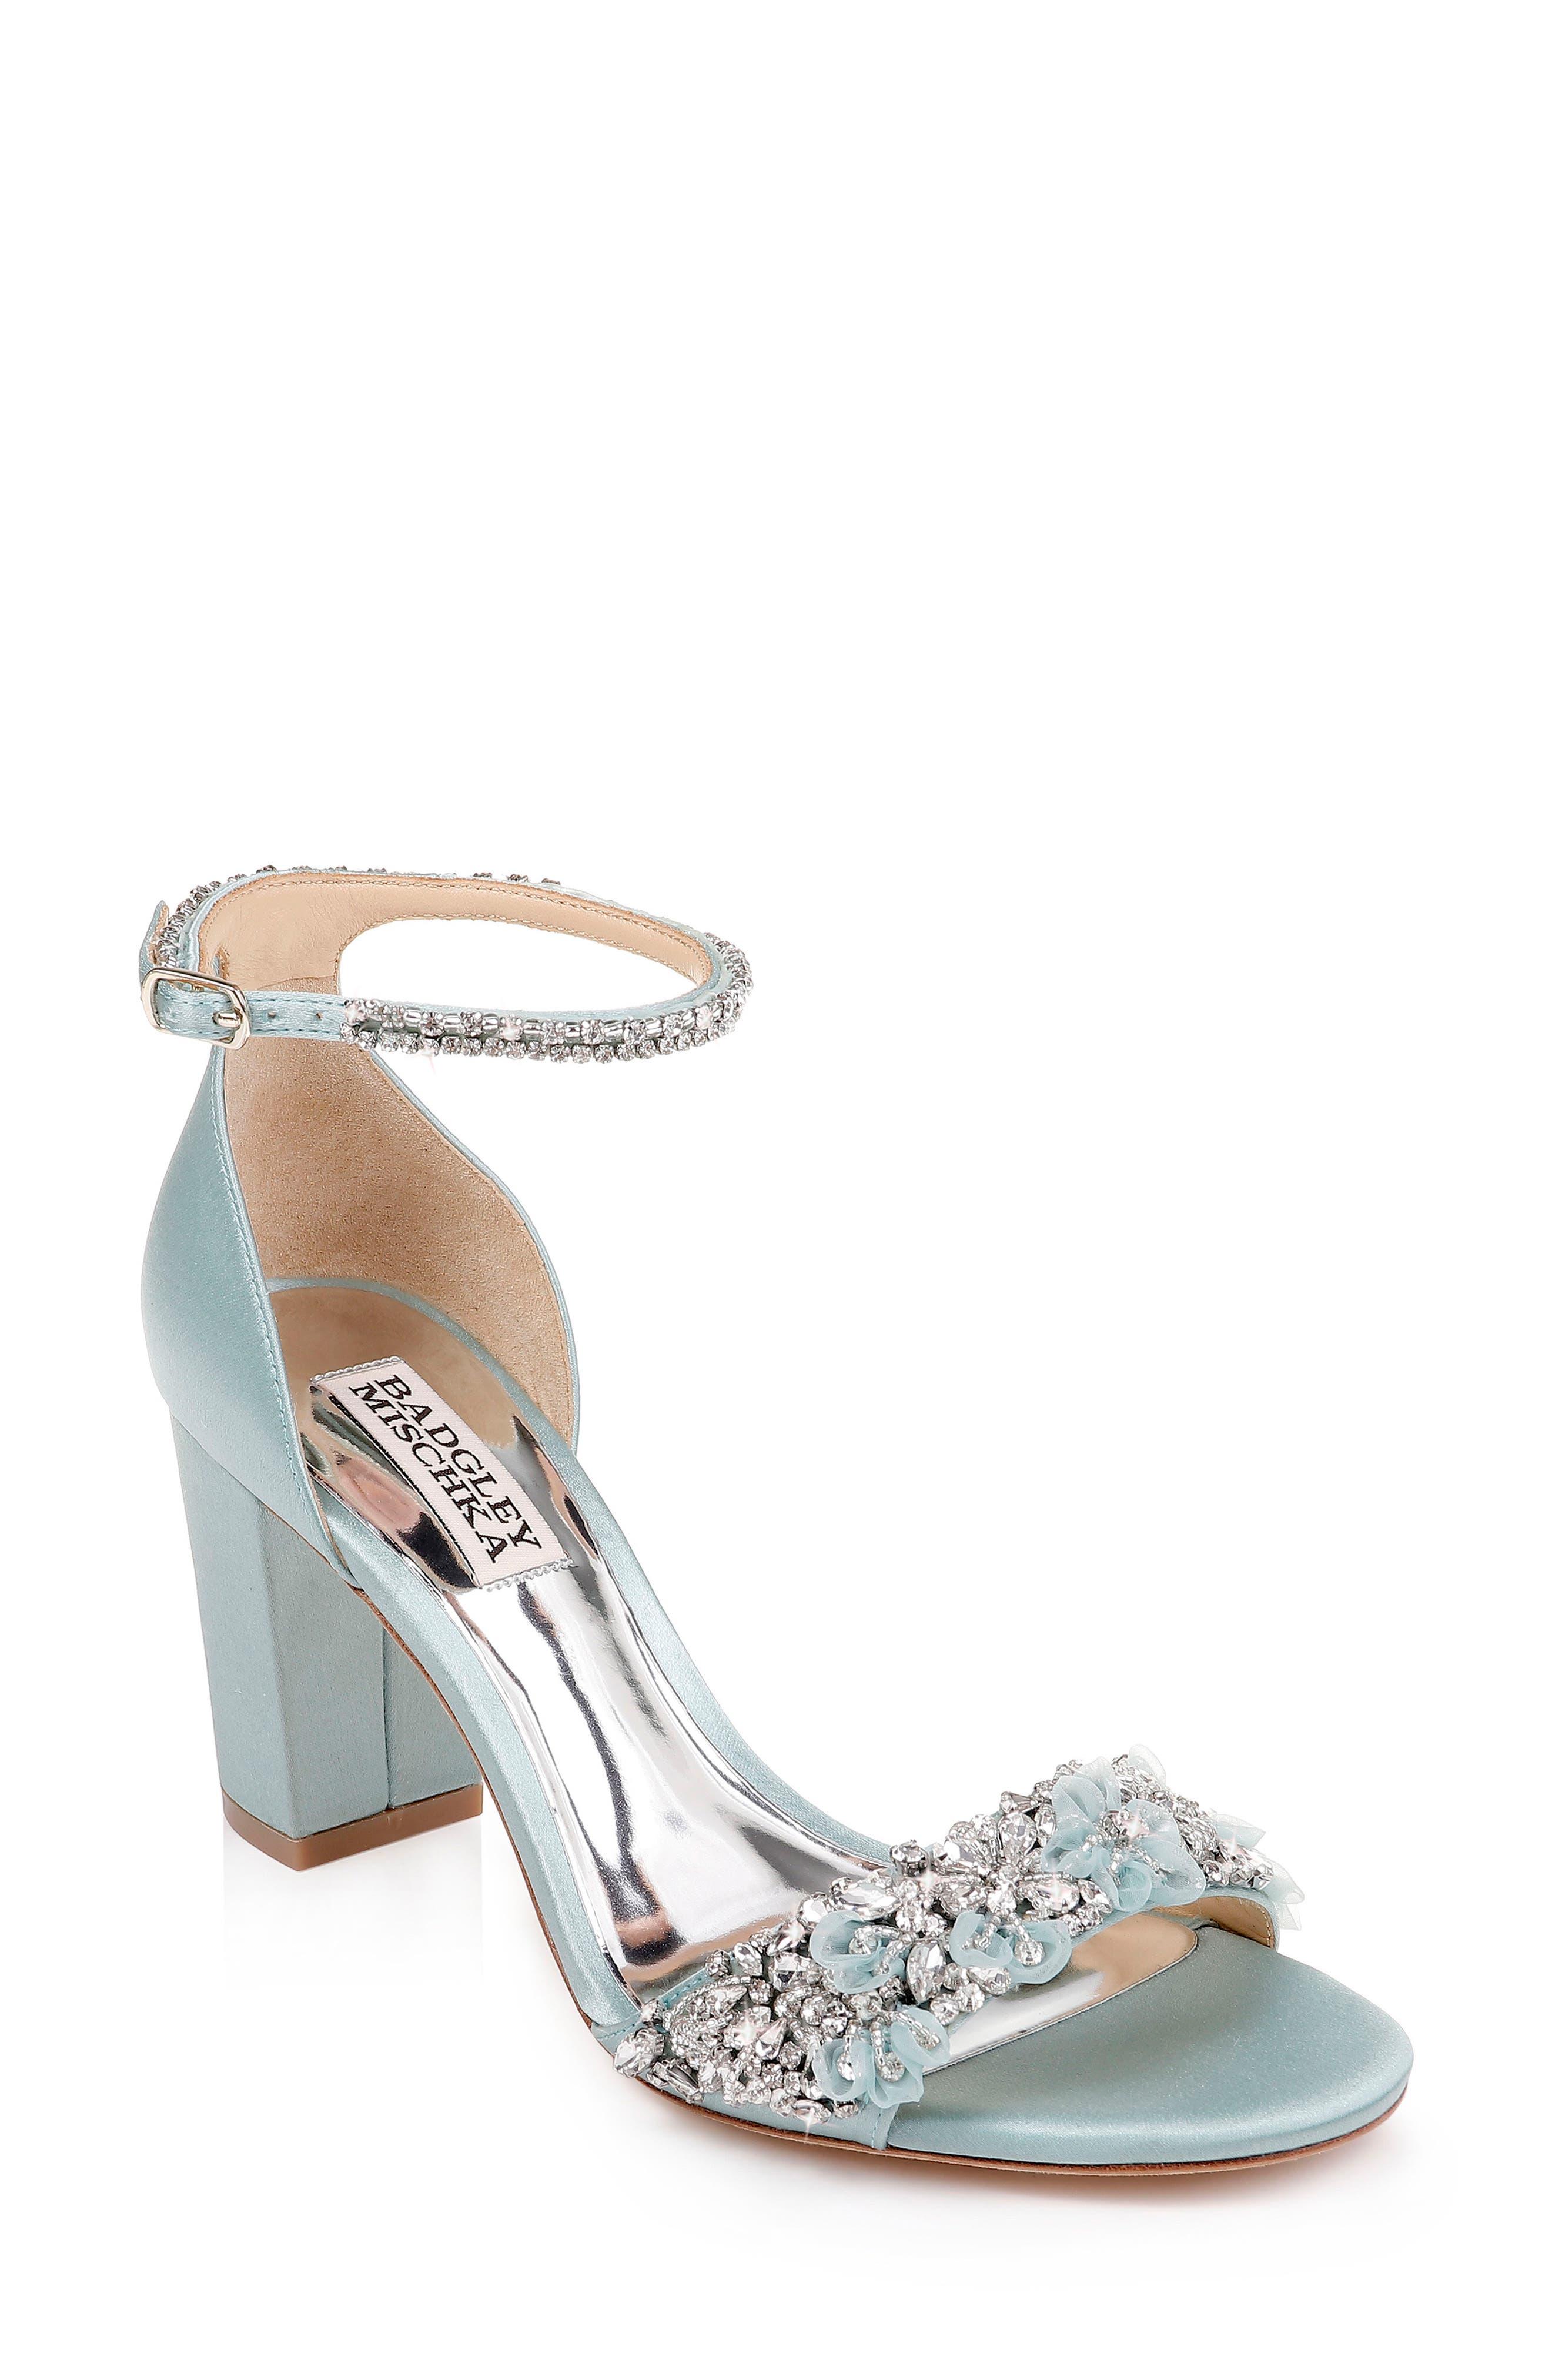 BADGLEY MISCHKA COLLECTION Badgley Mischka Finesse Ankle Strap Sandal, Main, color, BLUE RADIANCE SATIN